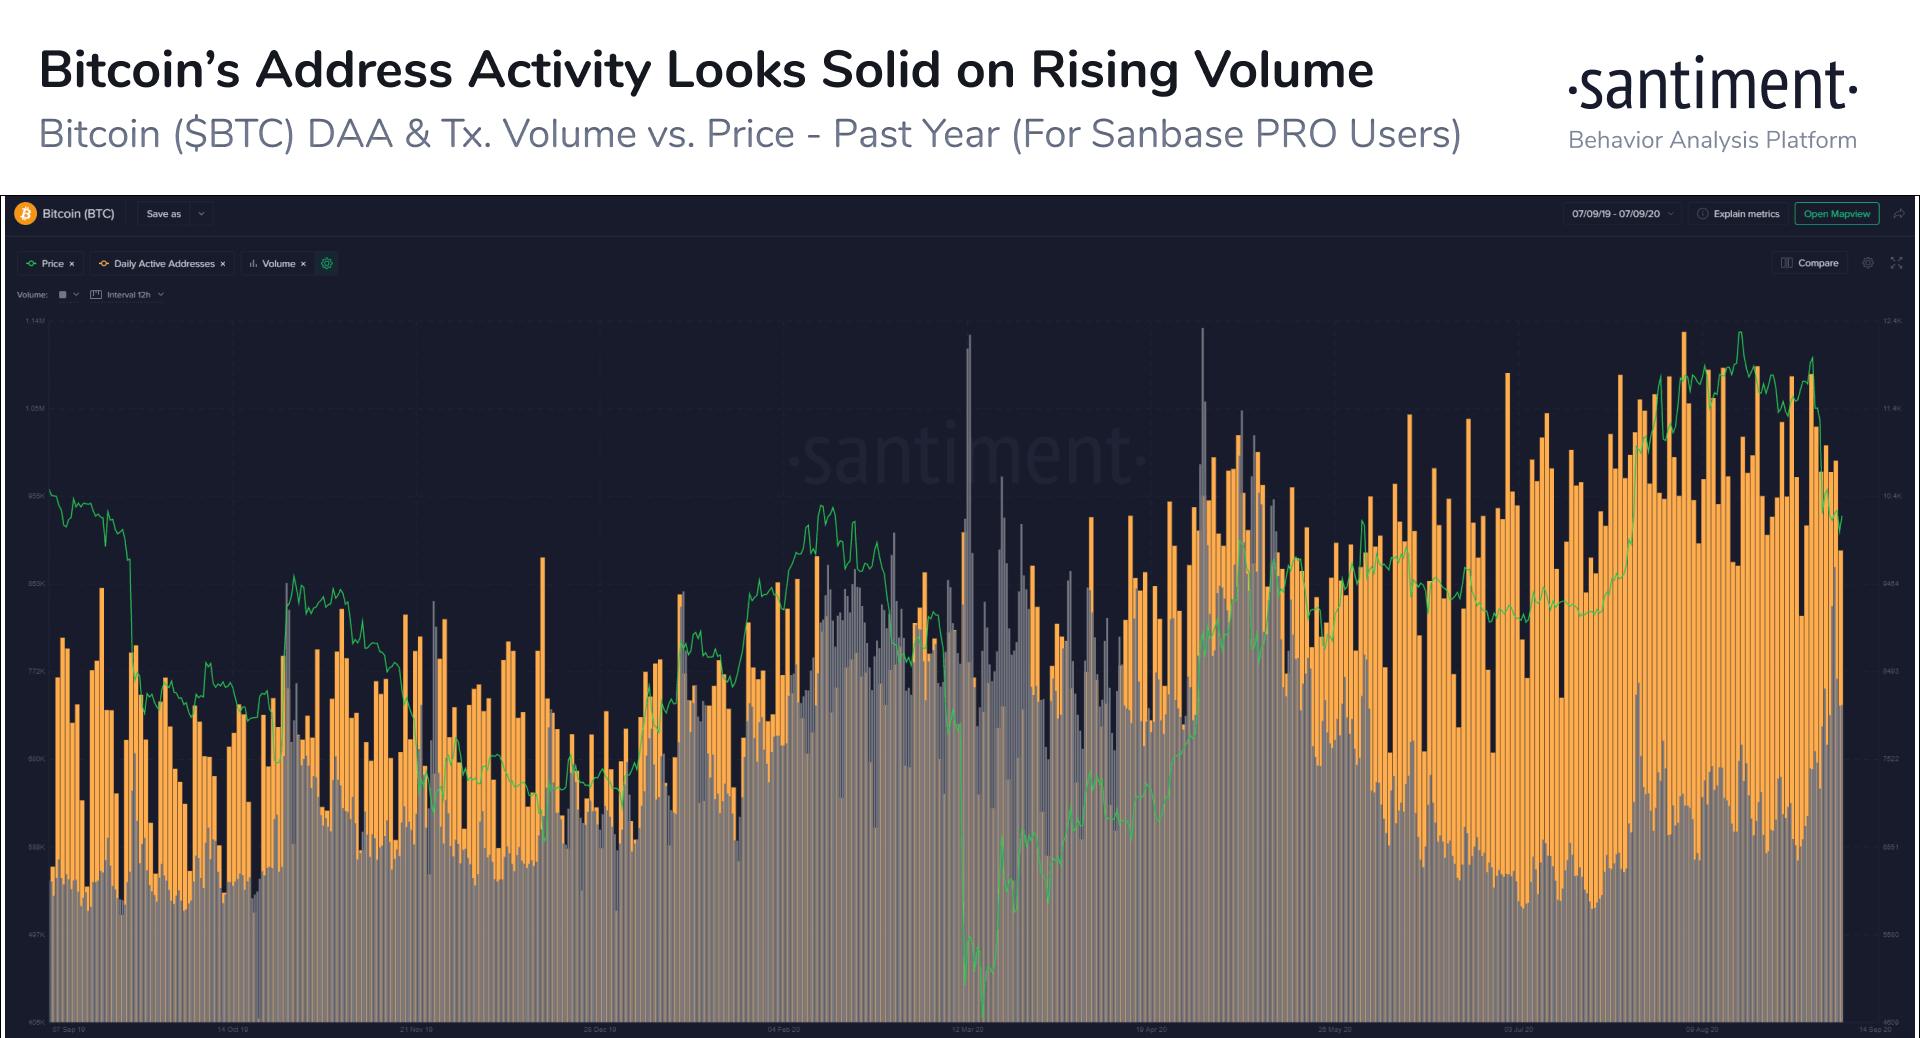 Bitcoin Active Addresses/Volume. Source: Santiment